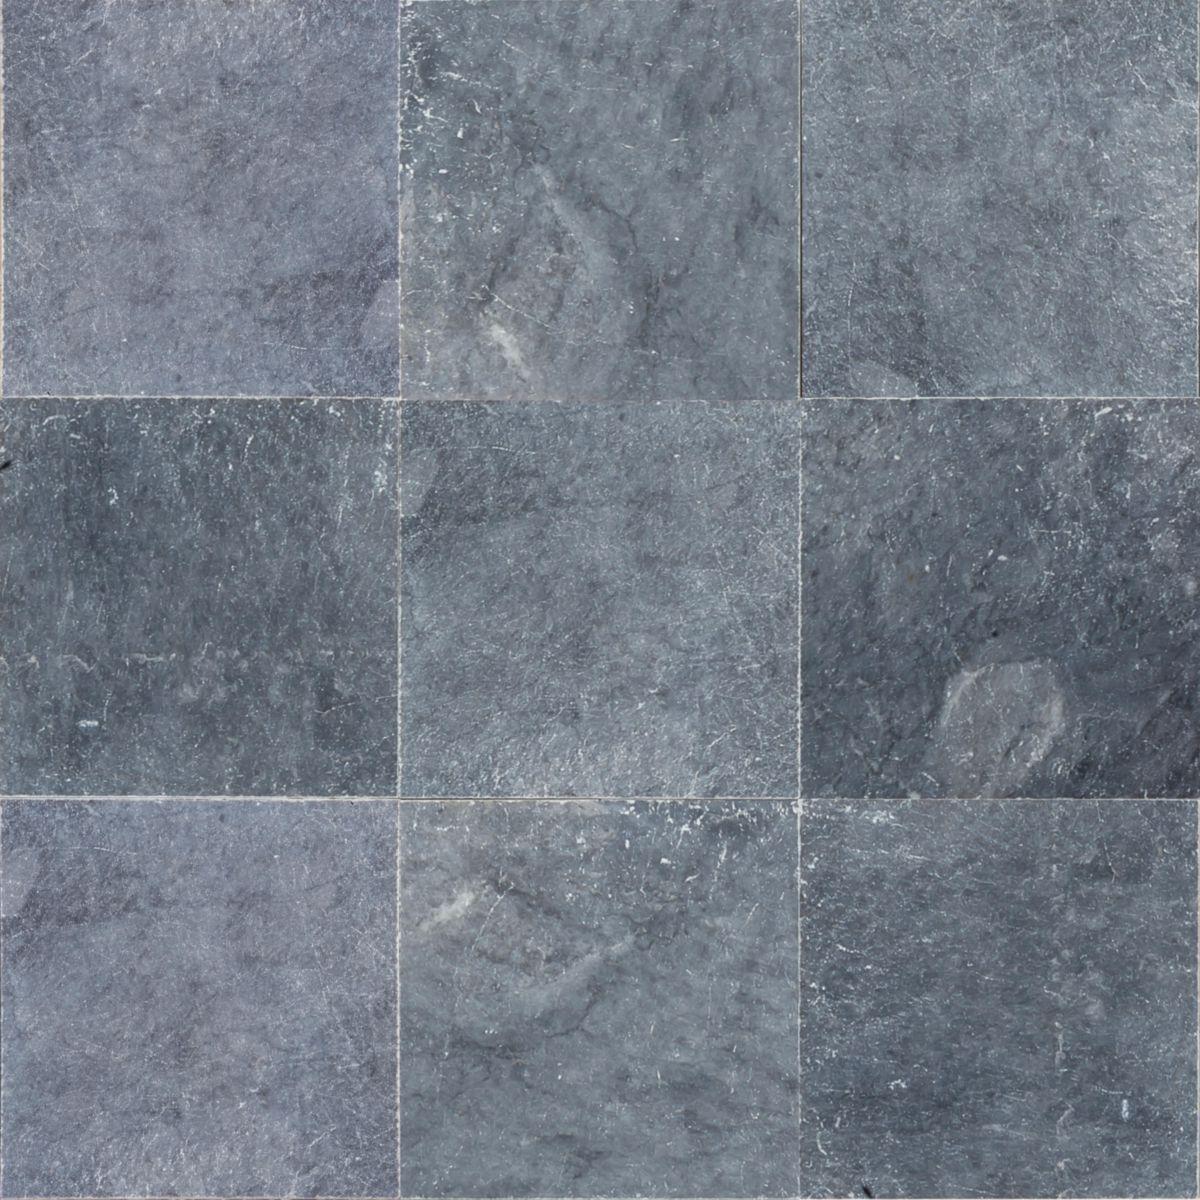 Extraordinaire BATI ORIENT IMPORT - Carrelage sol/mur intérieur marbre Manosque BR-09